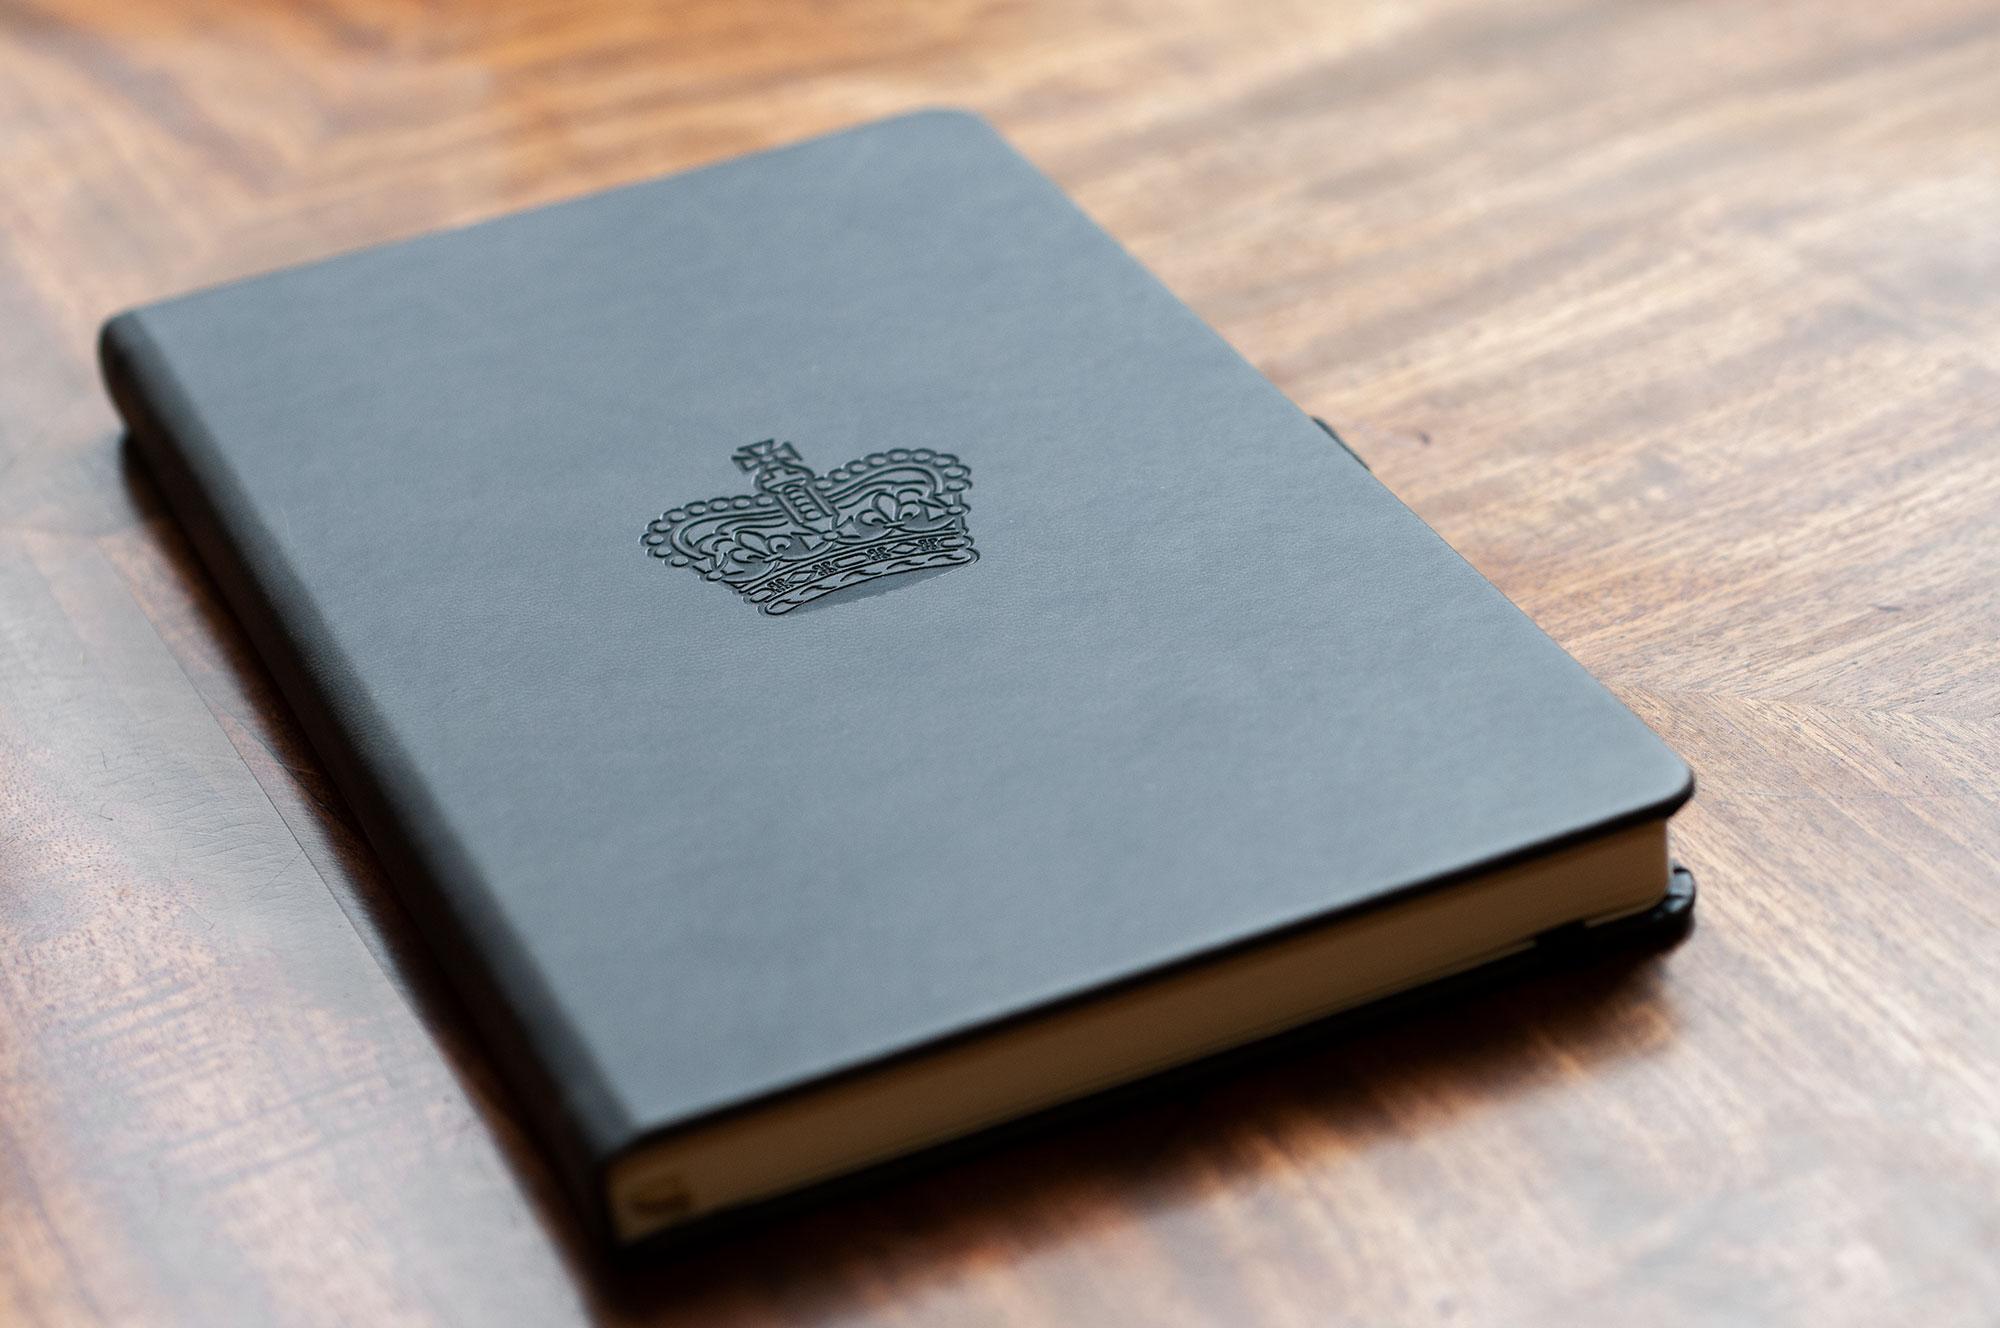 Embossed notebooks - simple crest